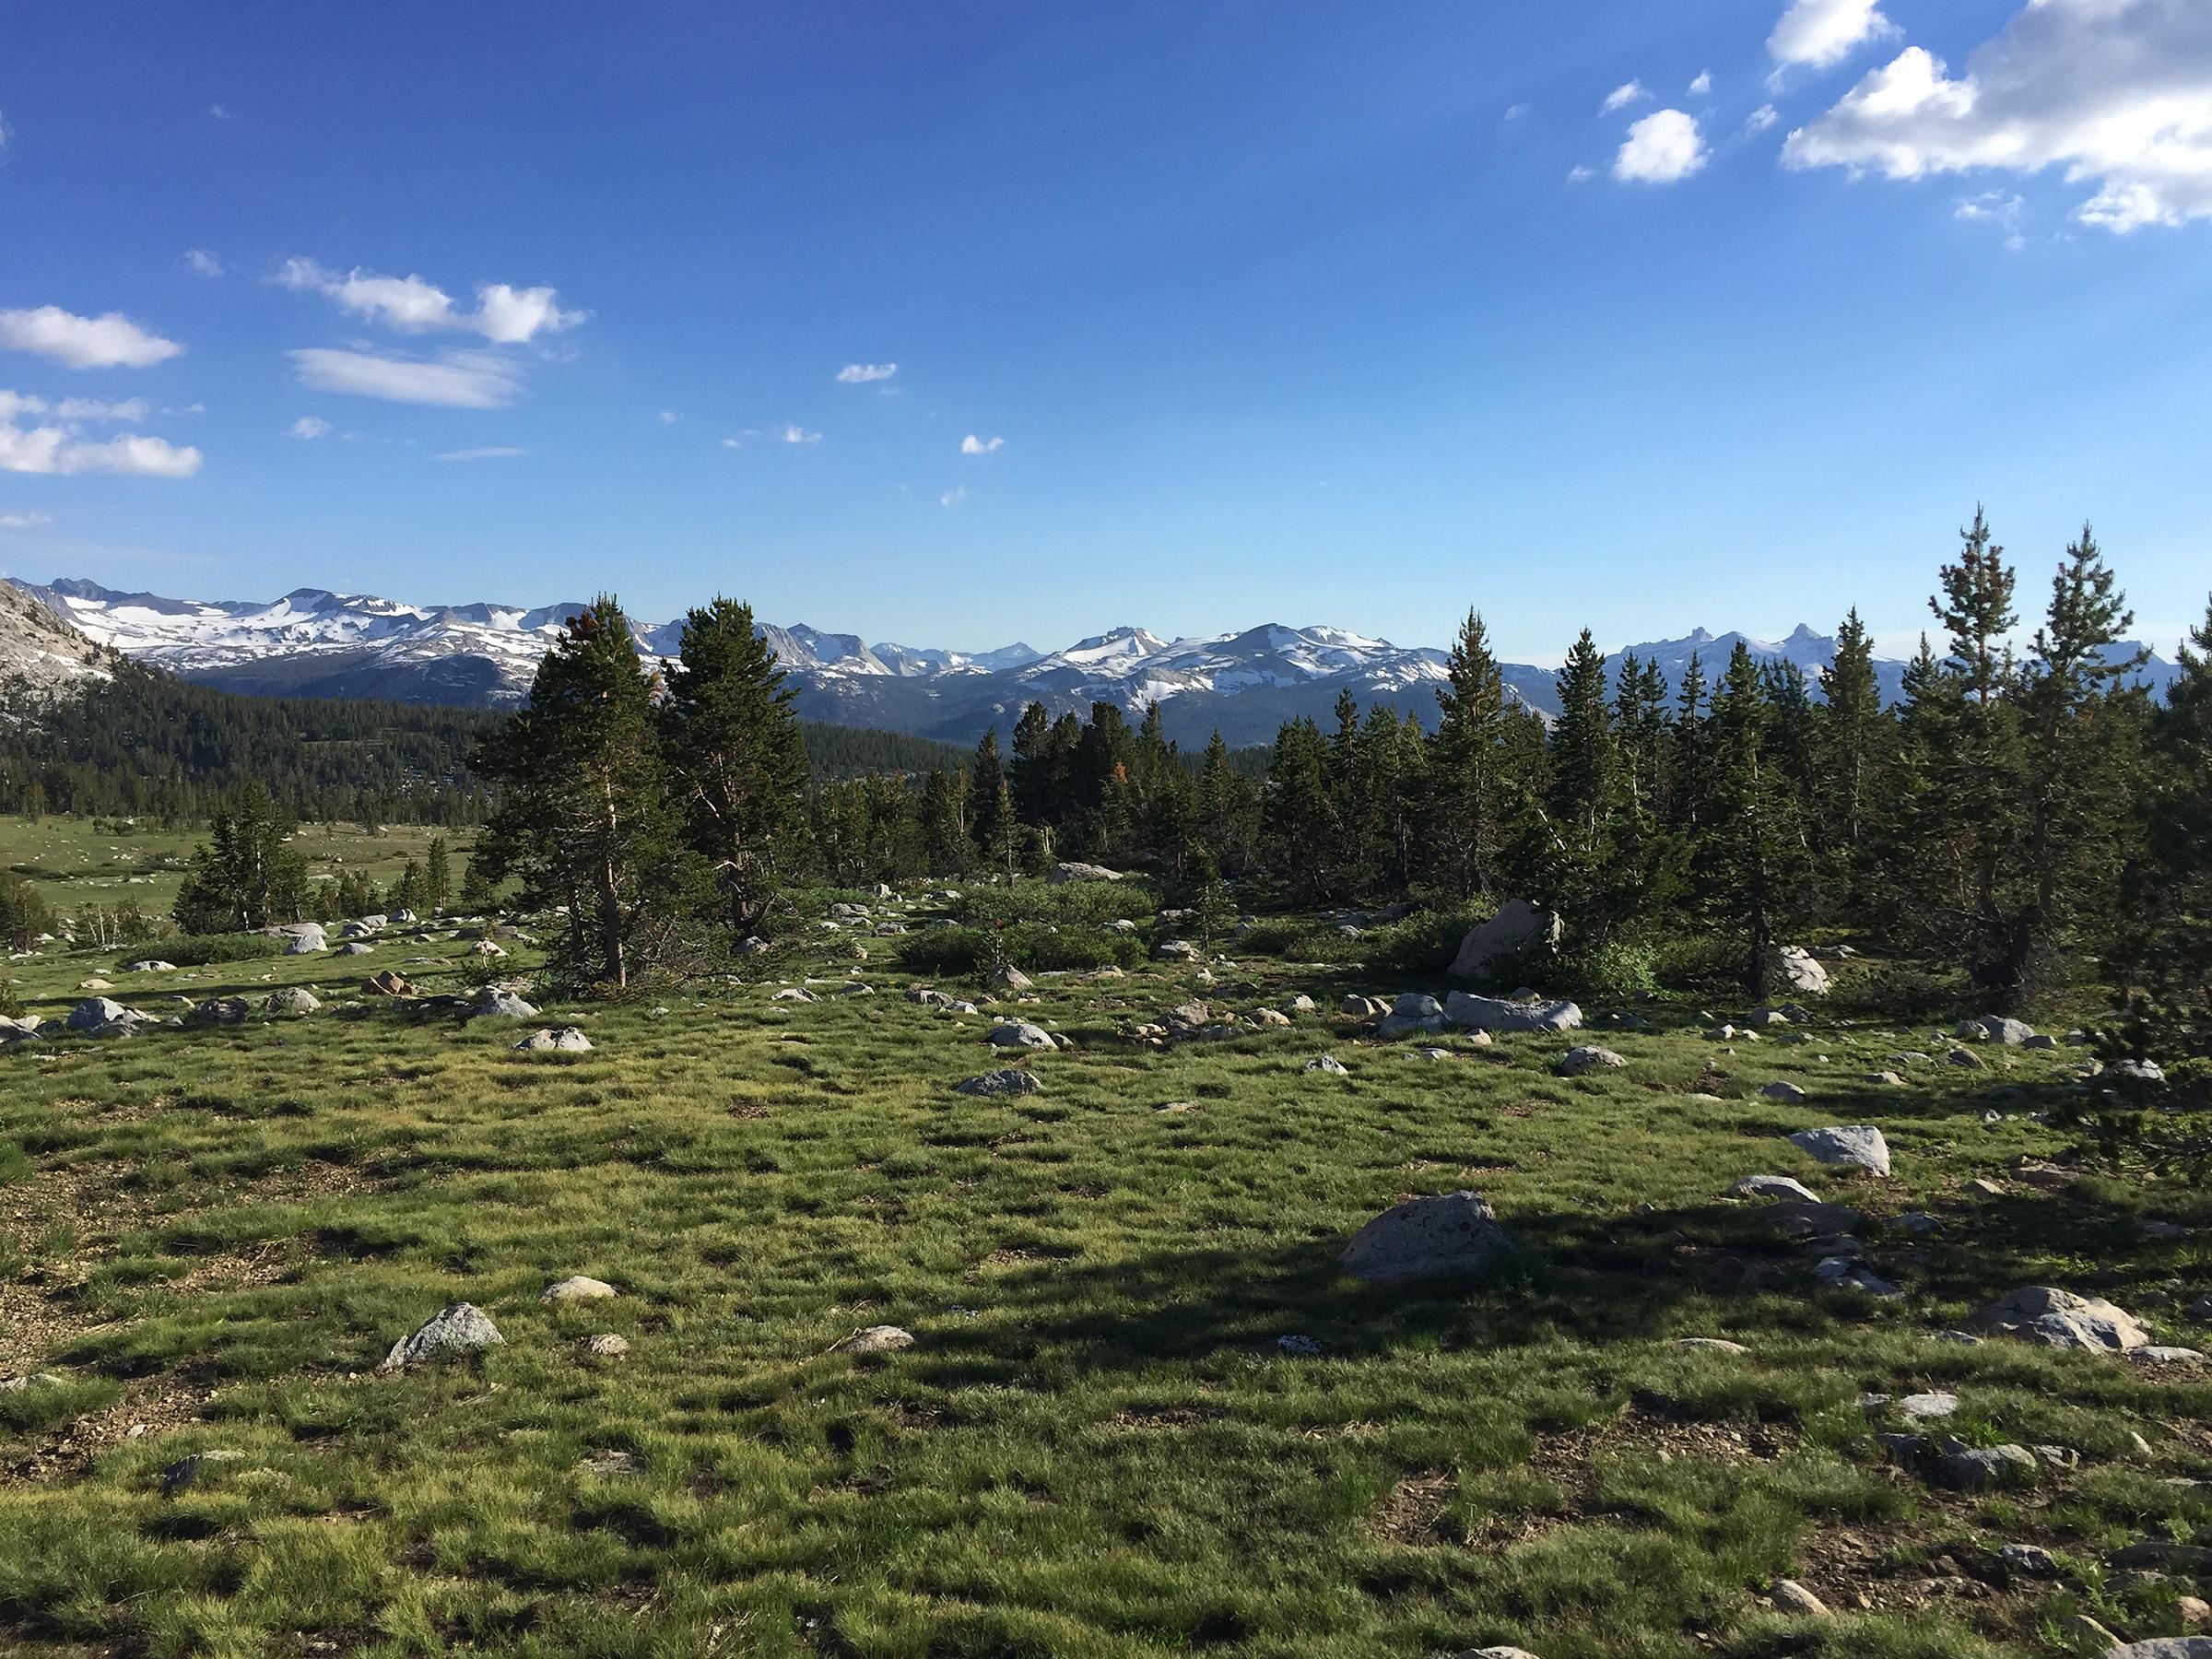 trailname-backstroke-sierra-high-route-2017_9992.jpg